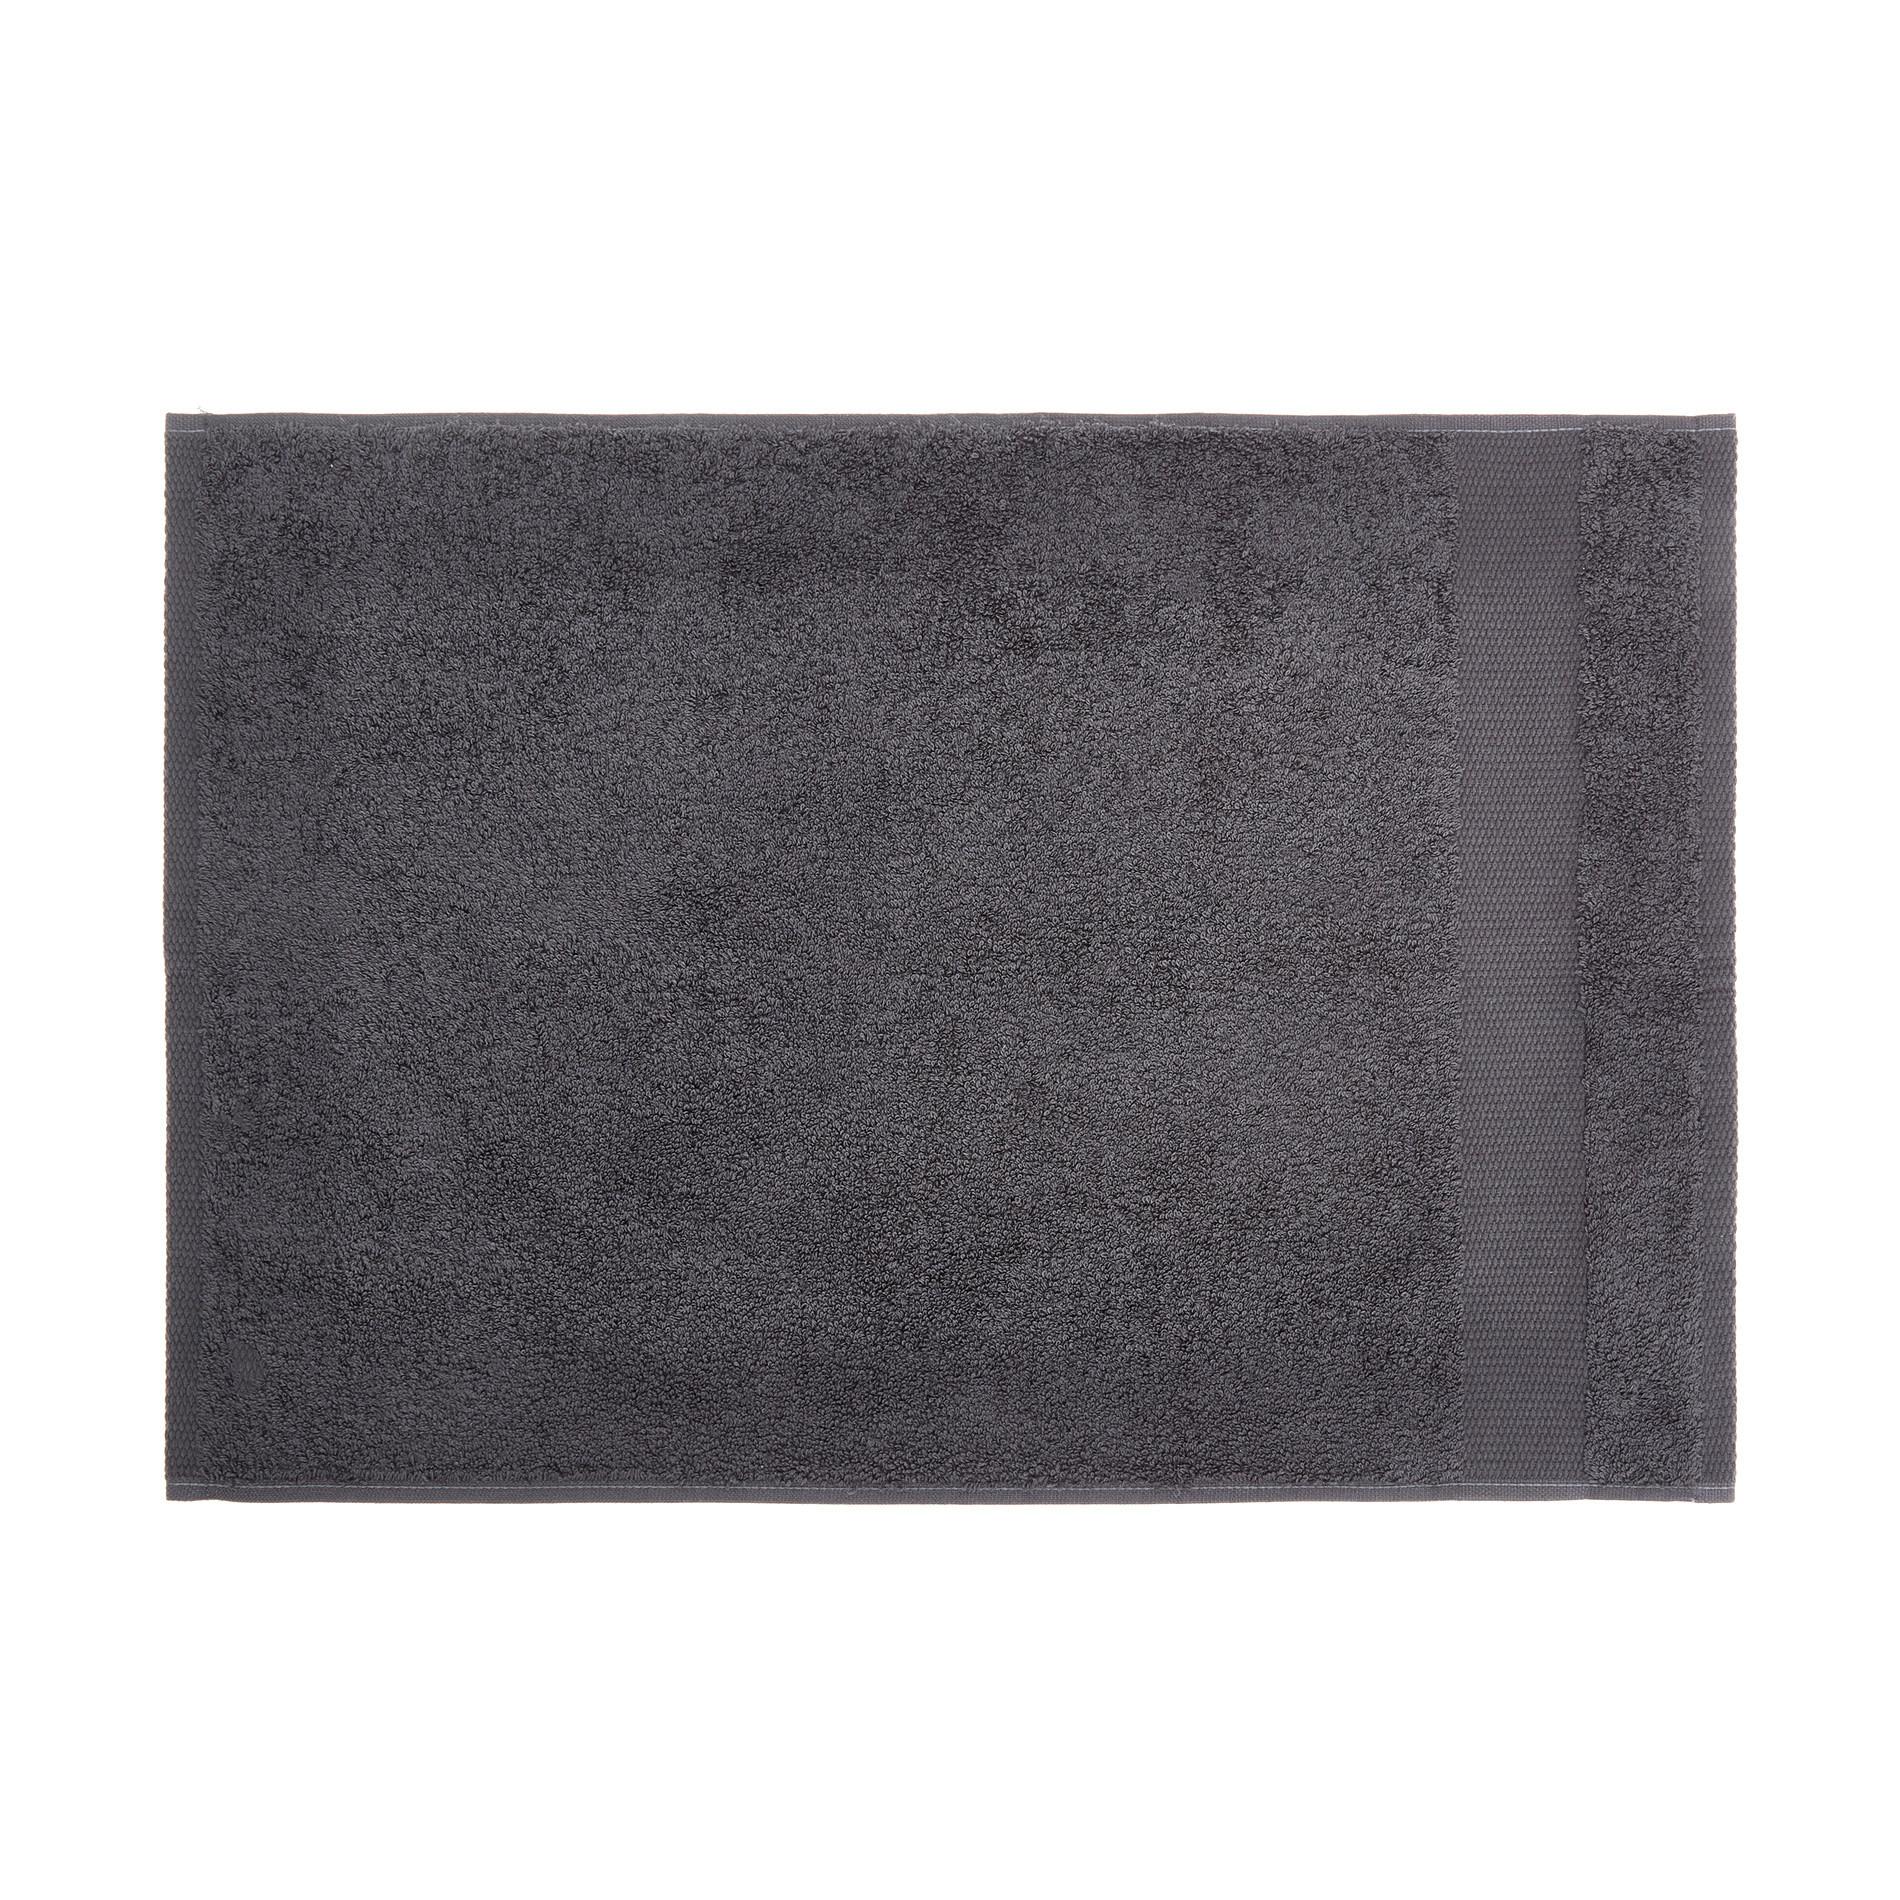 Asciugamano spugna di puro cotone Zefiro, Grigio scuro, large image number 2